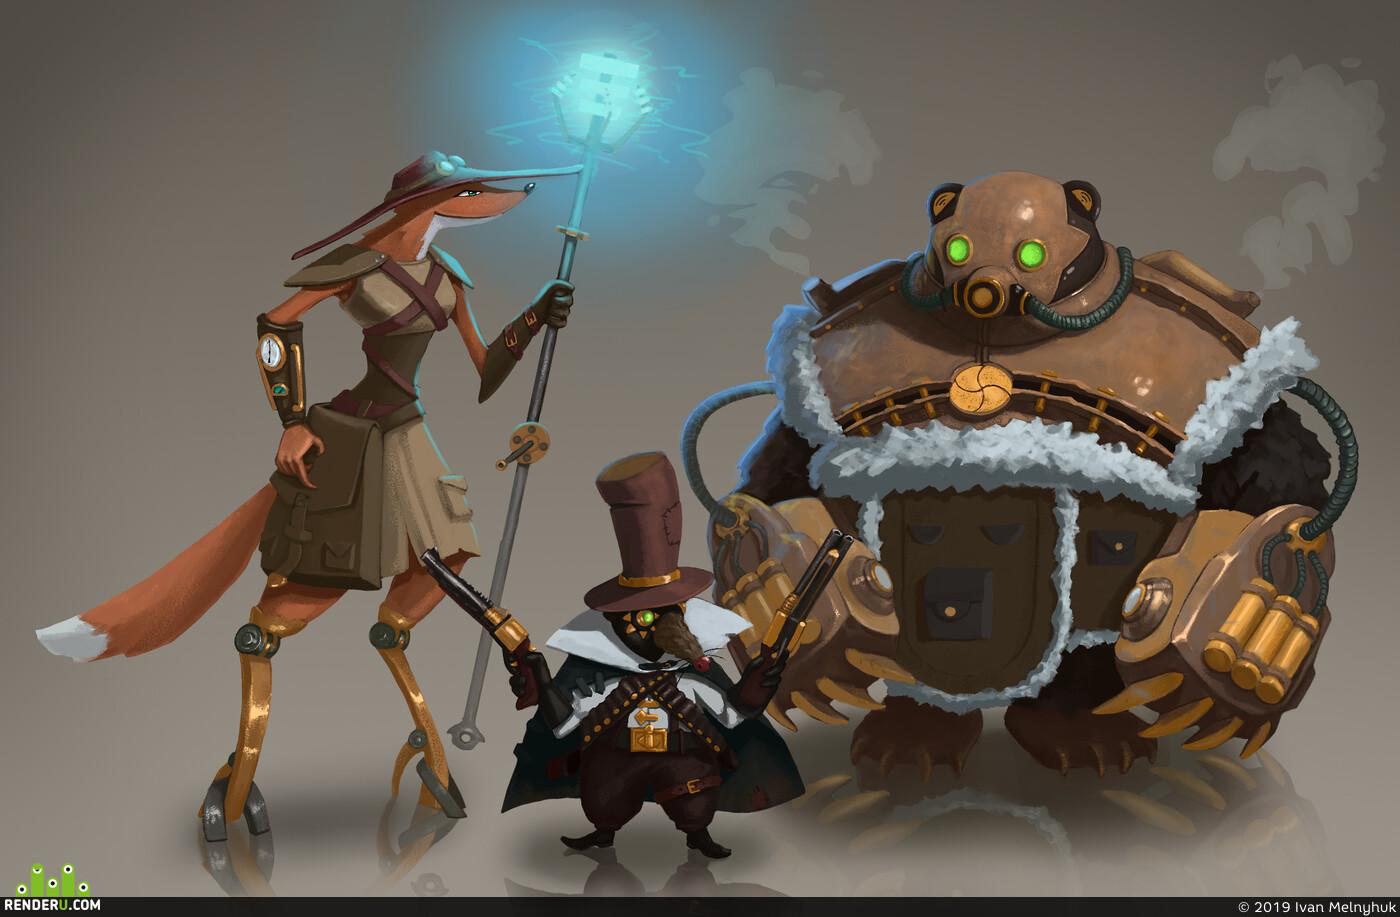 Characters, Concept Art, steampunk, Digital 2D, fox, rat, bear